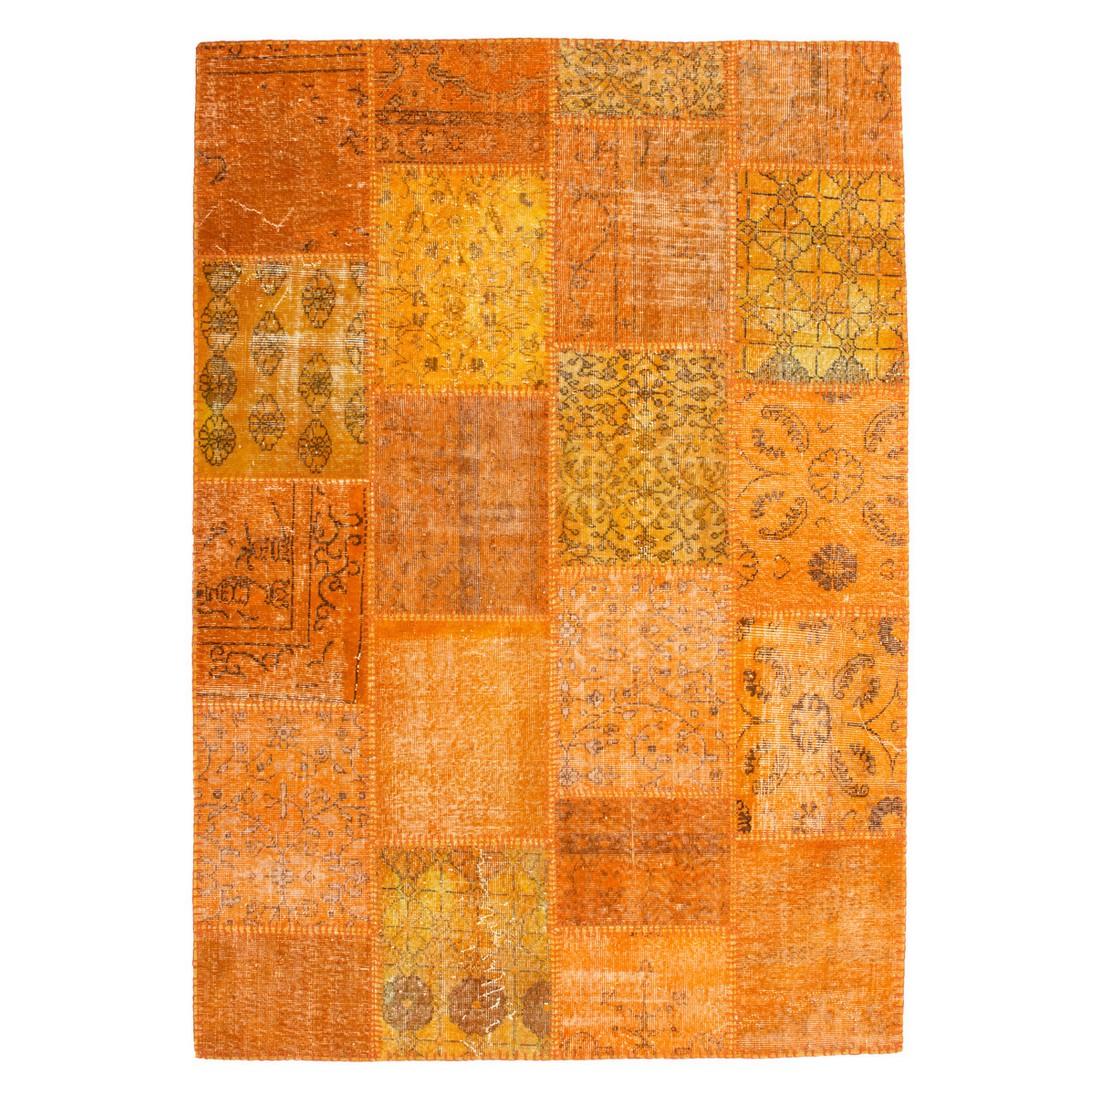 Teppich Atlas - Orange - 200 x 290 cm, Obsession